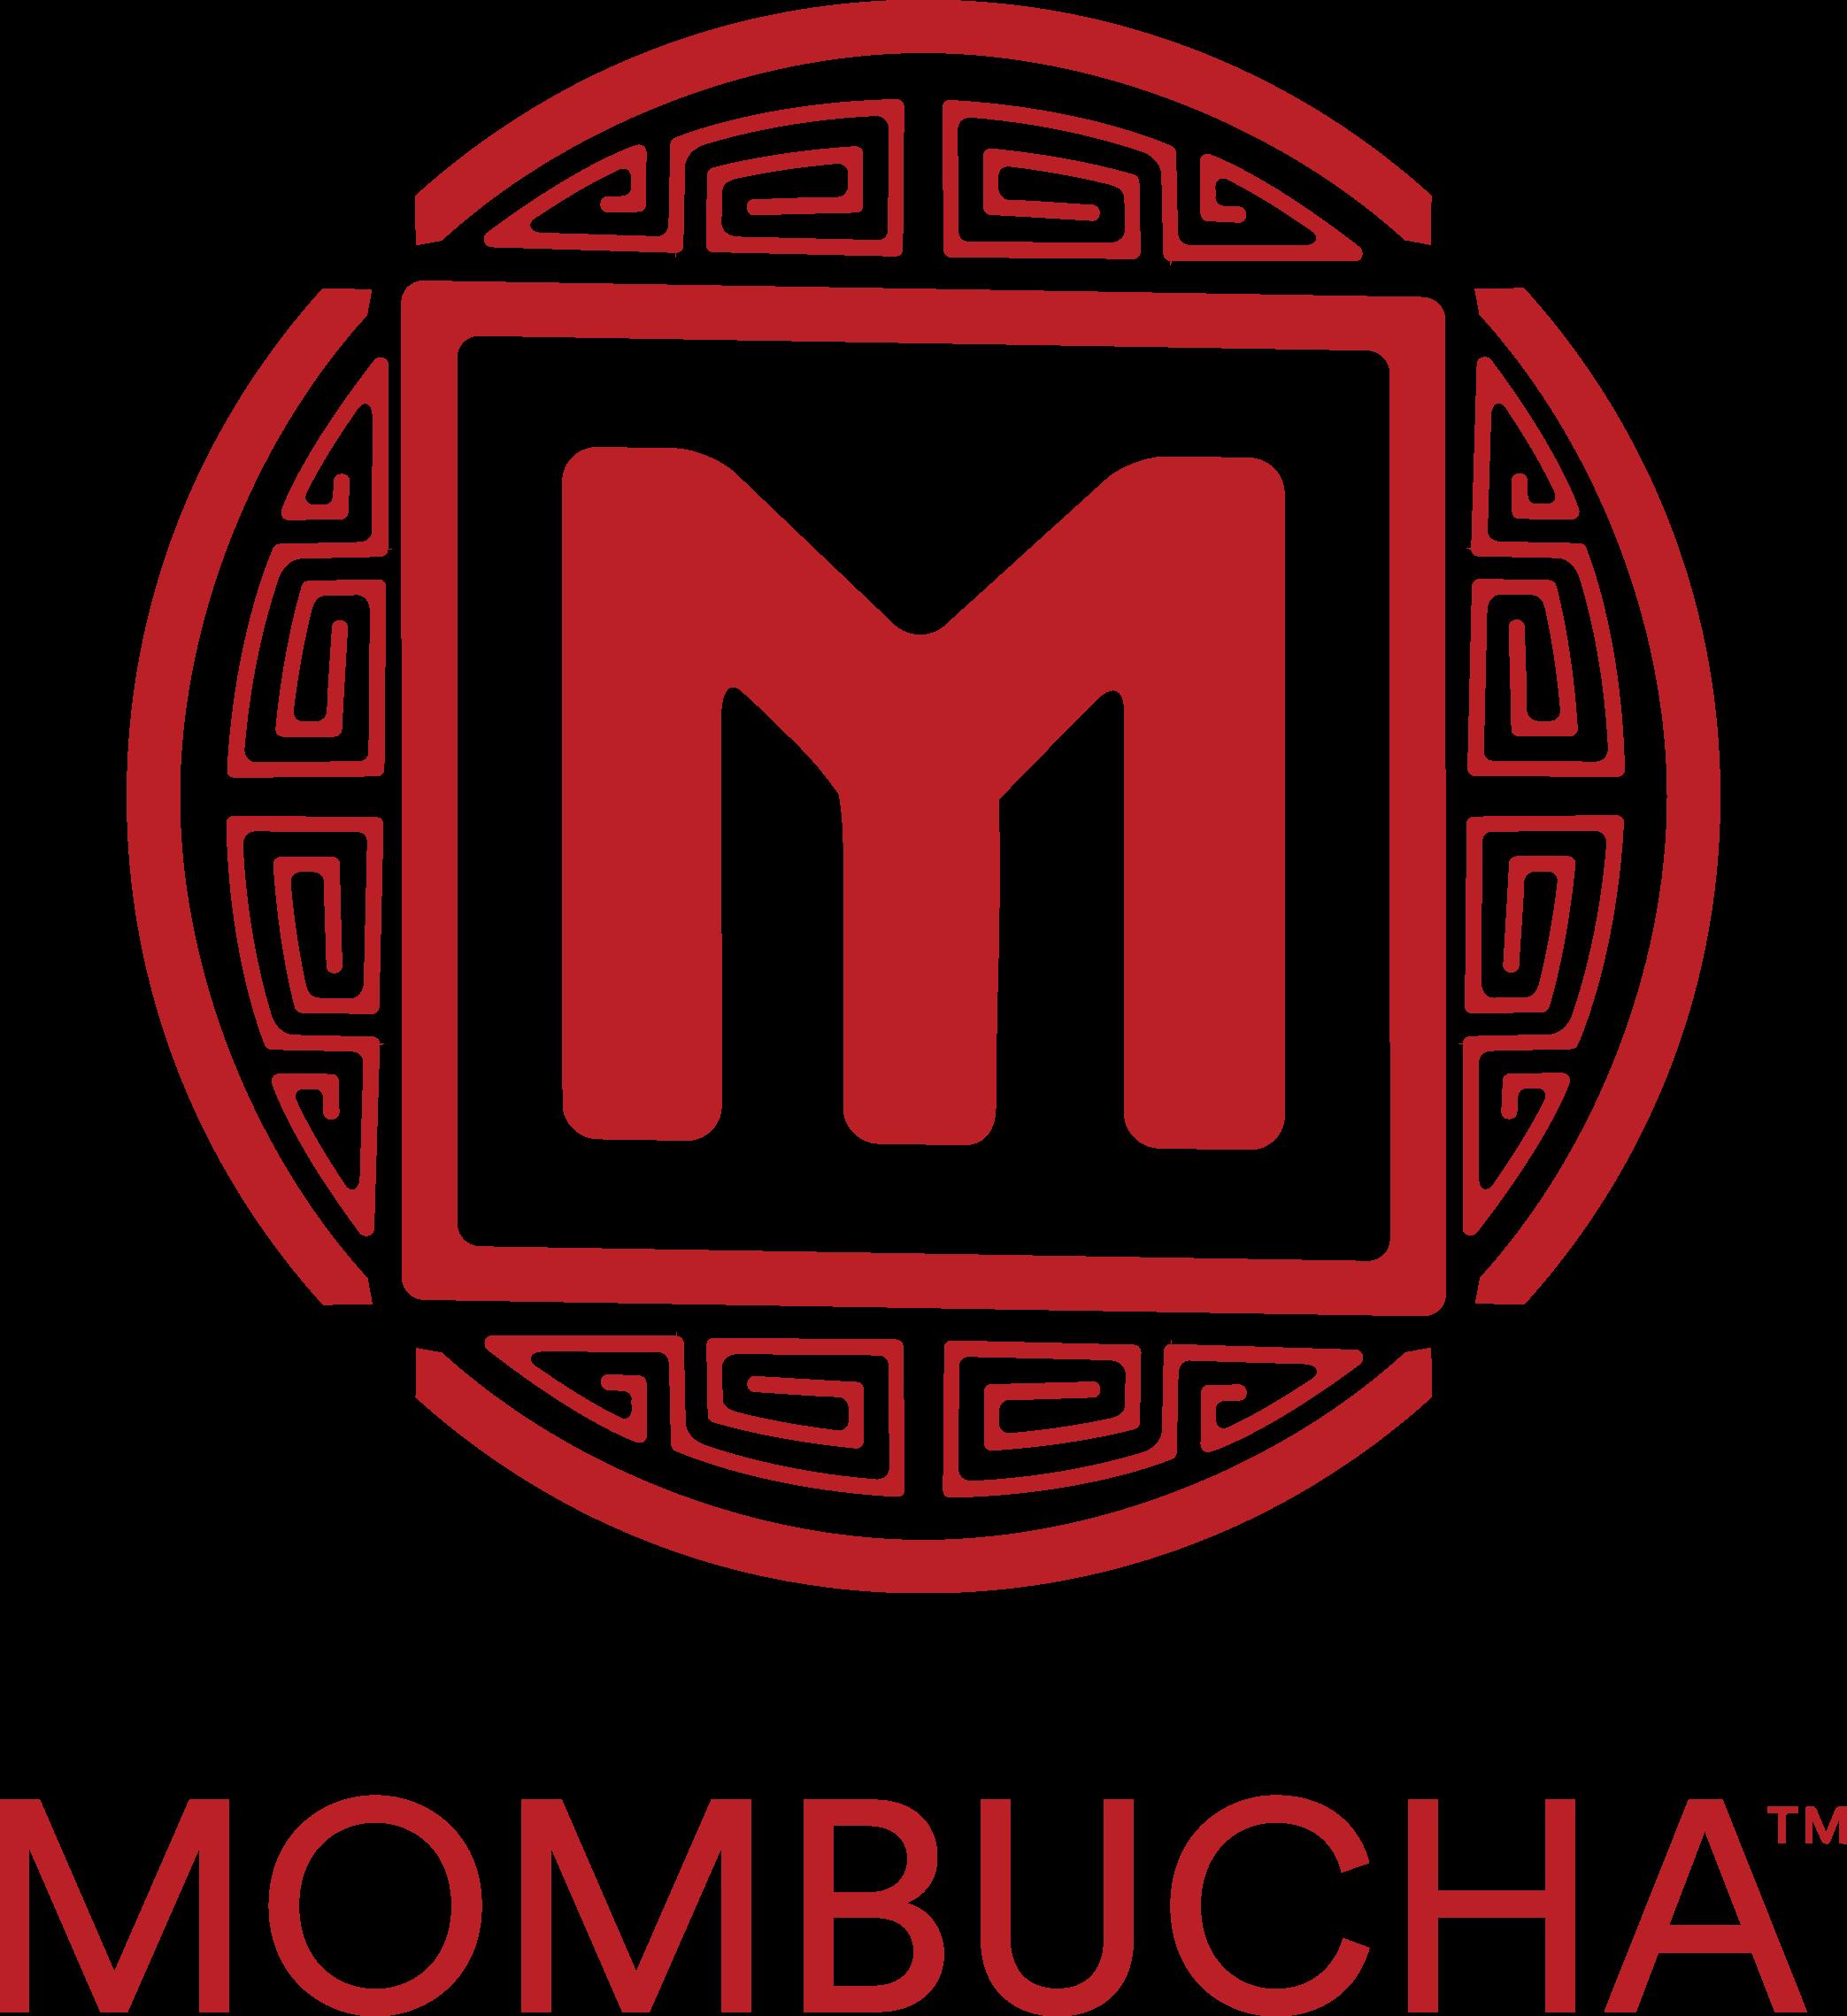 MOMBUCHA_LOGO_Press_Red.png